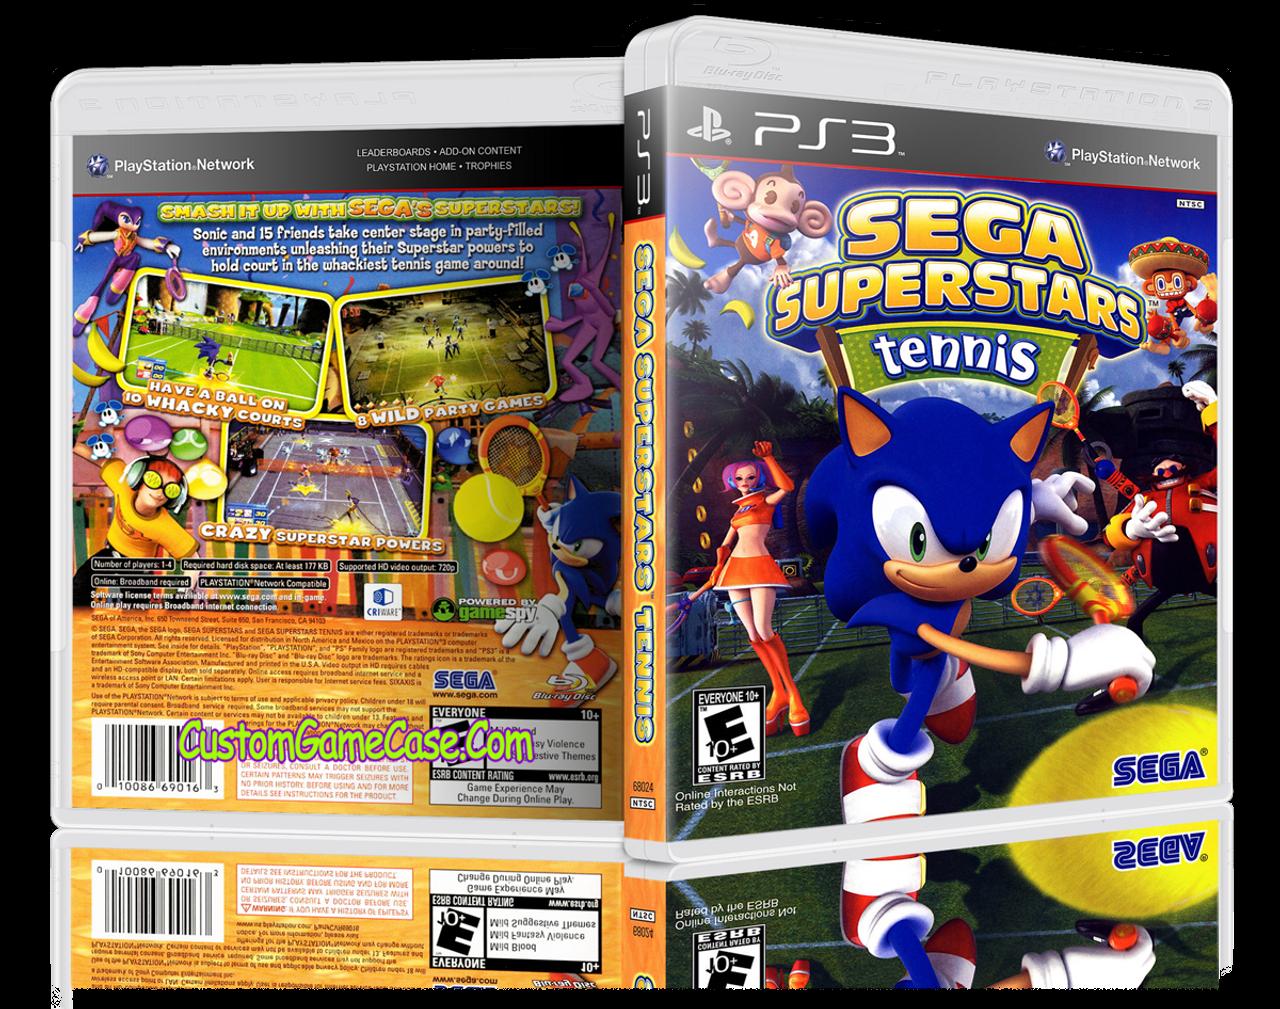 Sega Superstars Tennis - Sony PlayStation 3 PS3 - Empty Custom Replacement Case